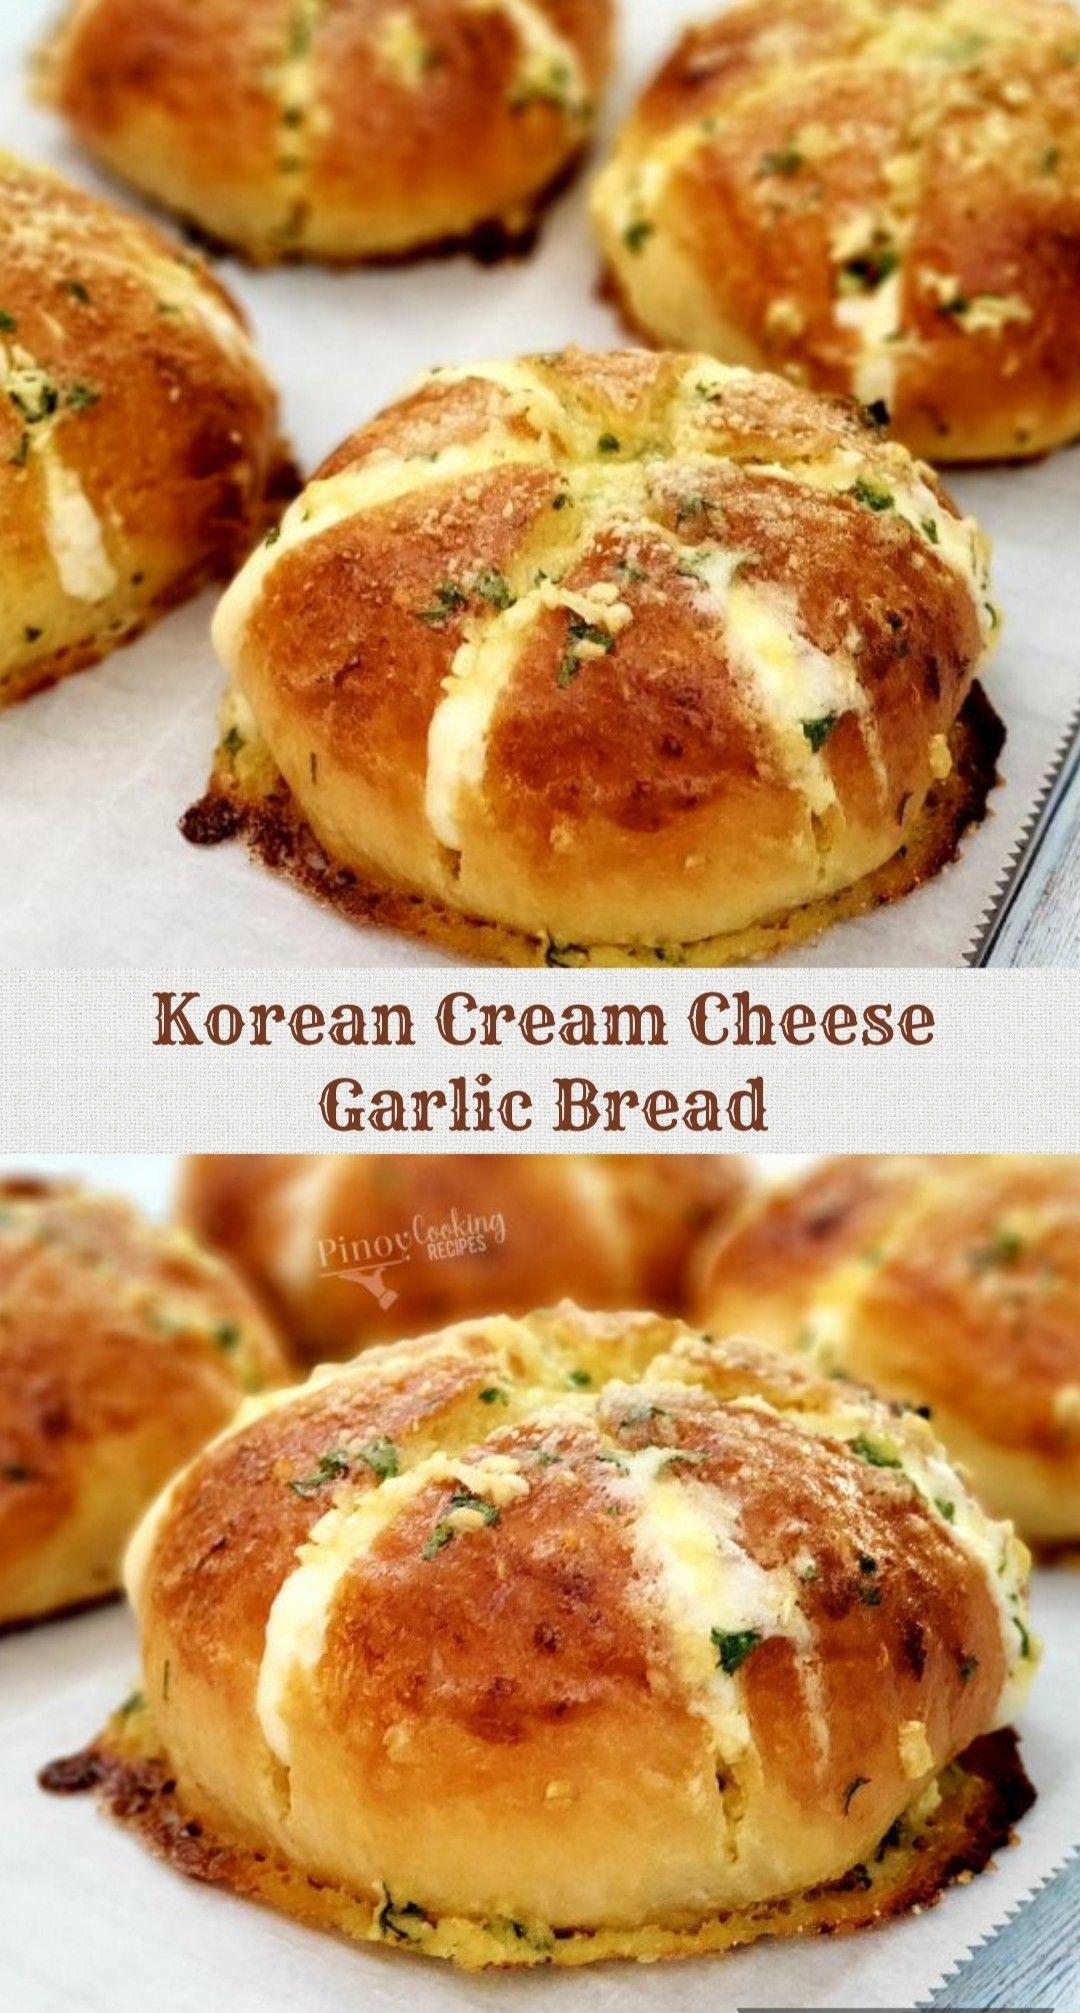 I Made Cream Cheese Garlic Bread Korean Street Food In 2020 Garlic Cheese Bread Food Homemade Bread